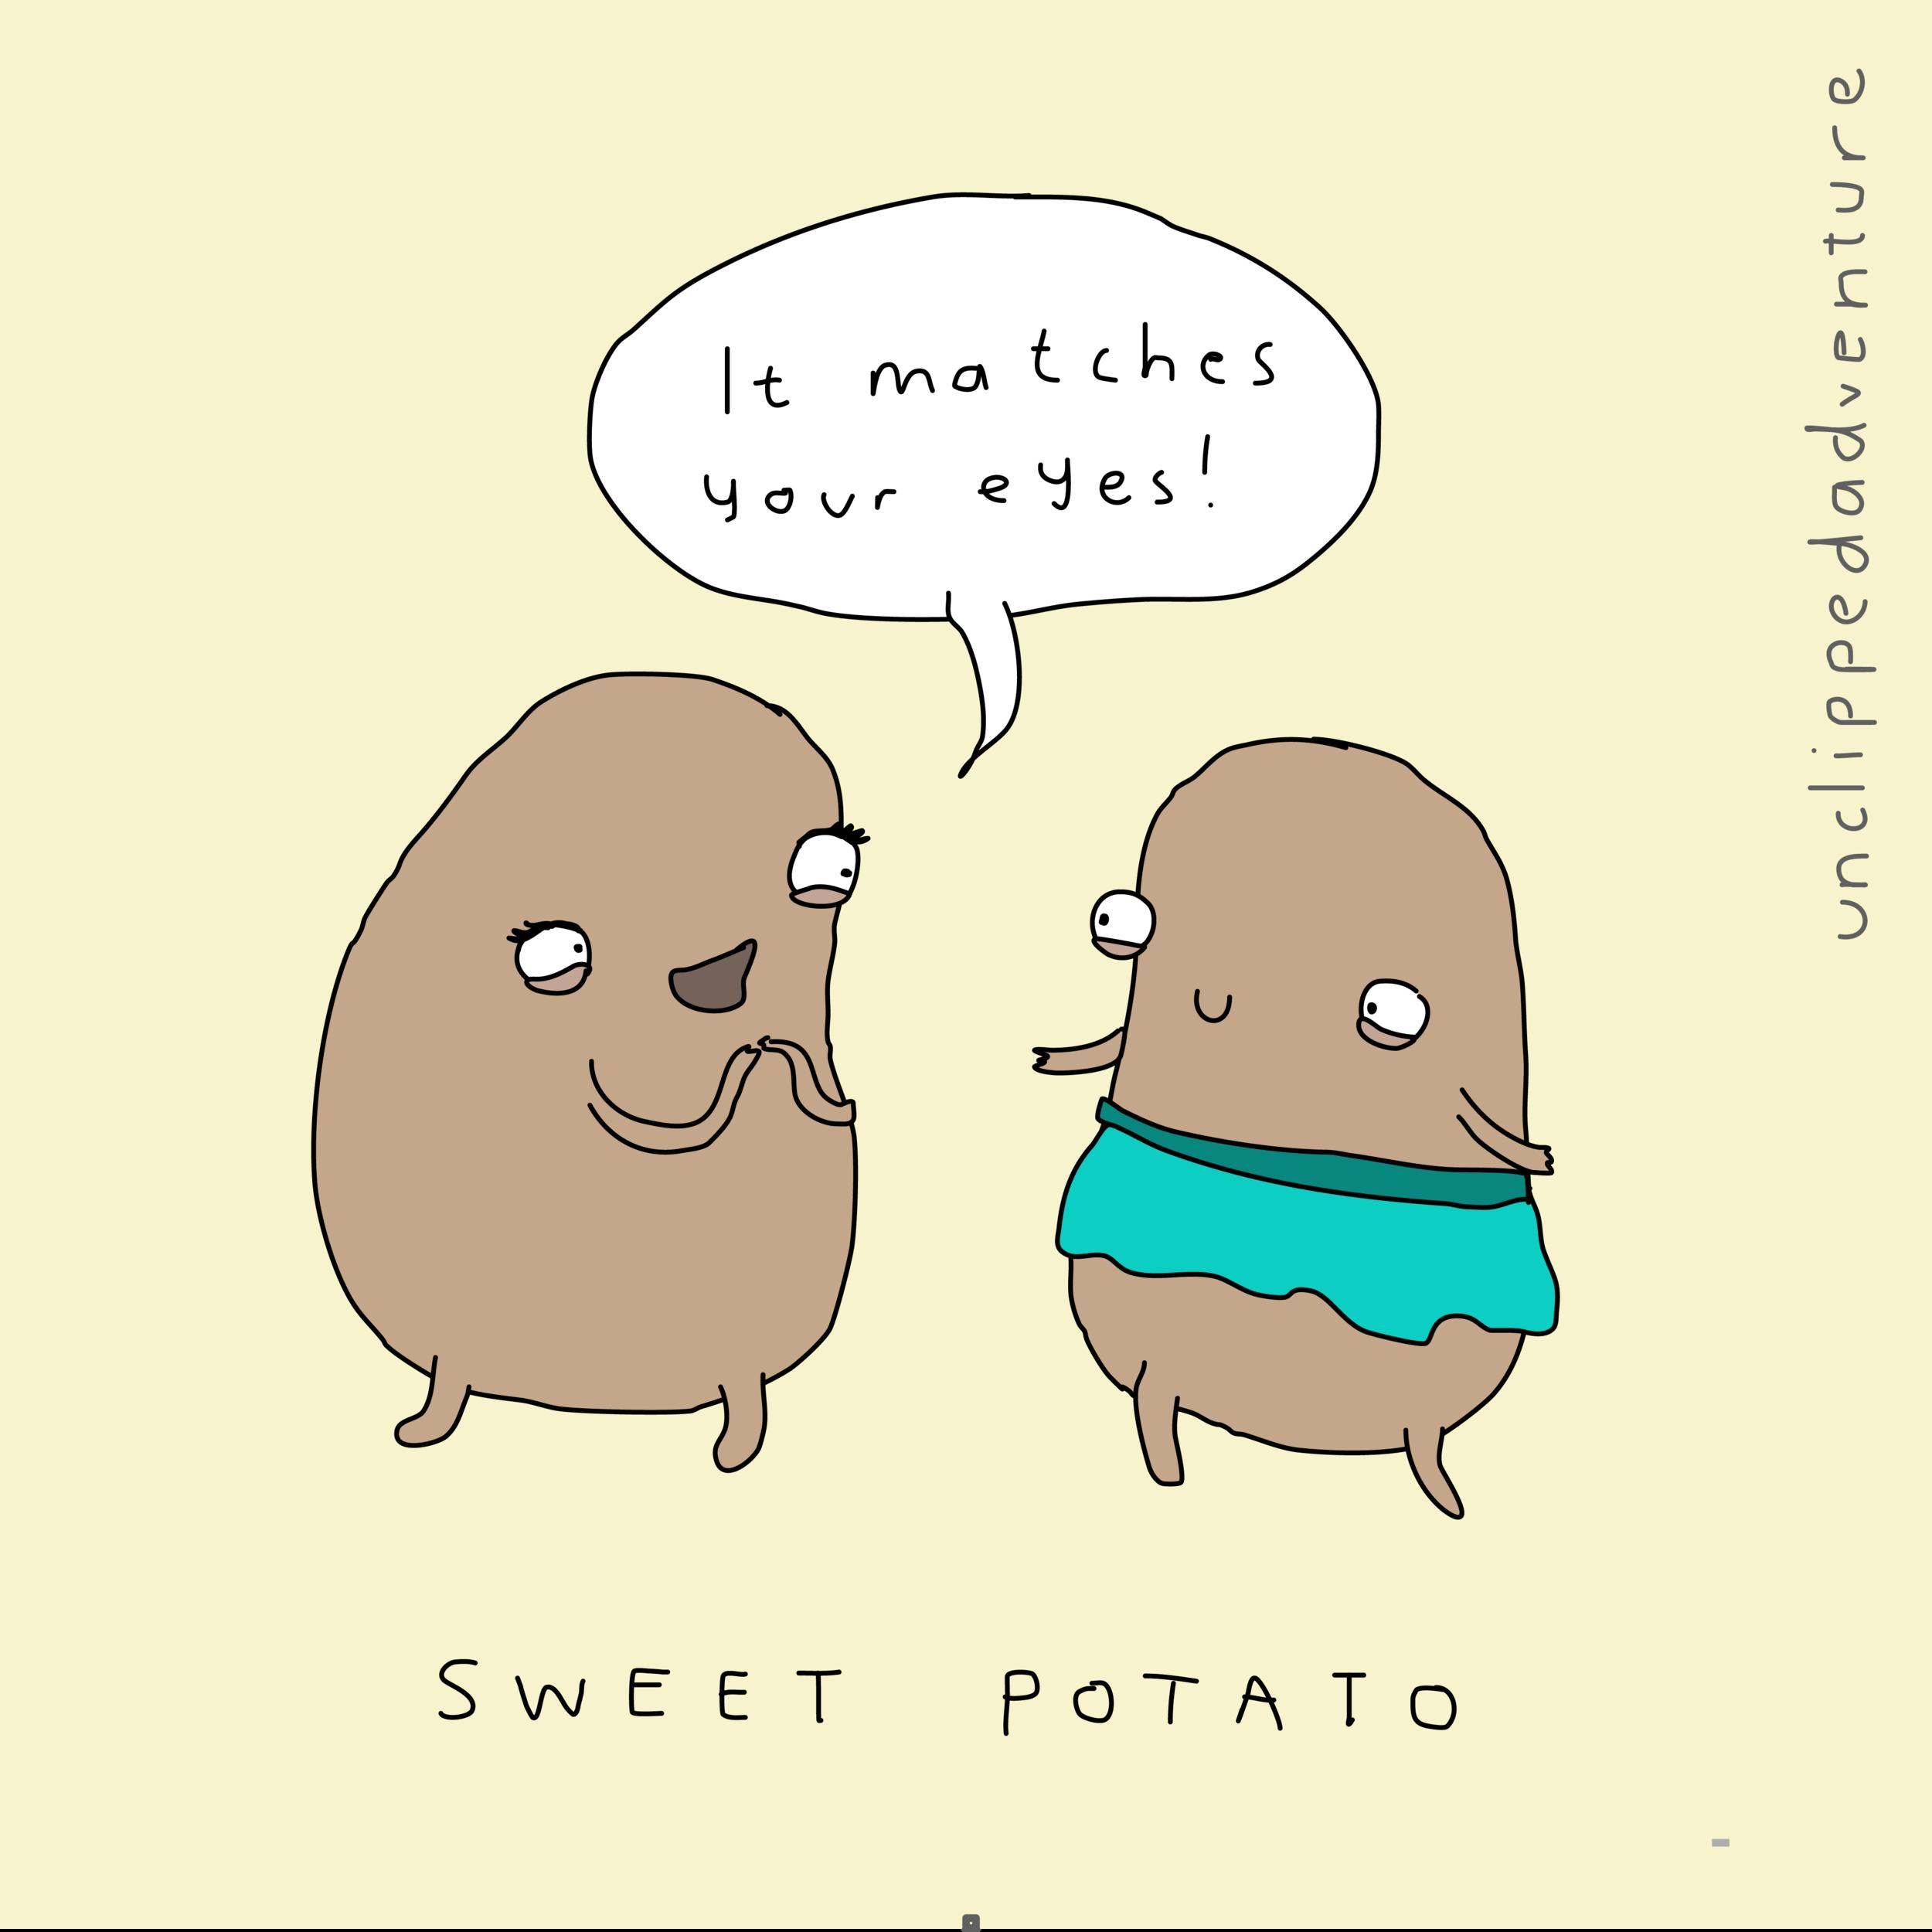 sweet potato-09.png